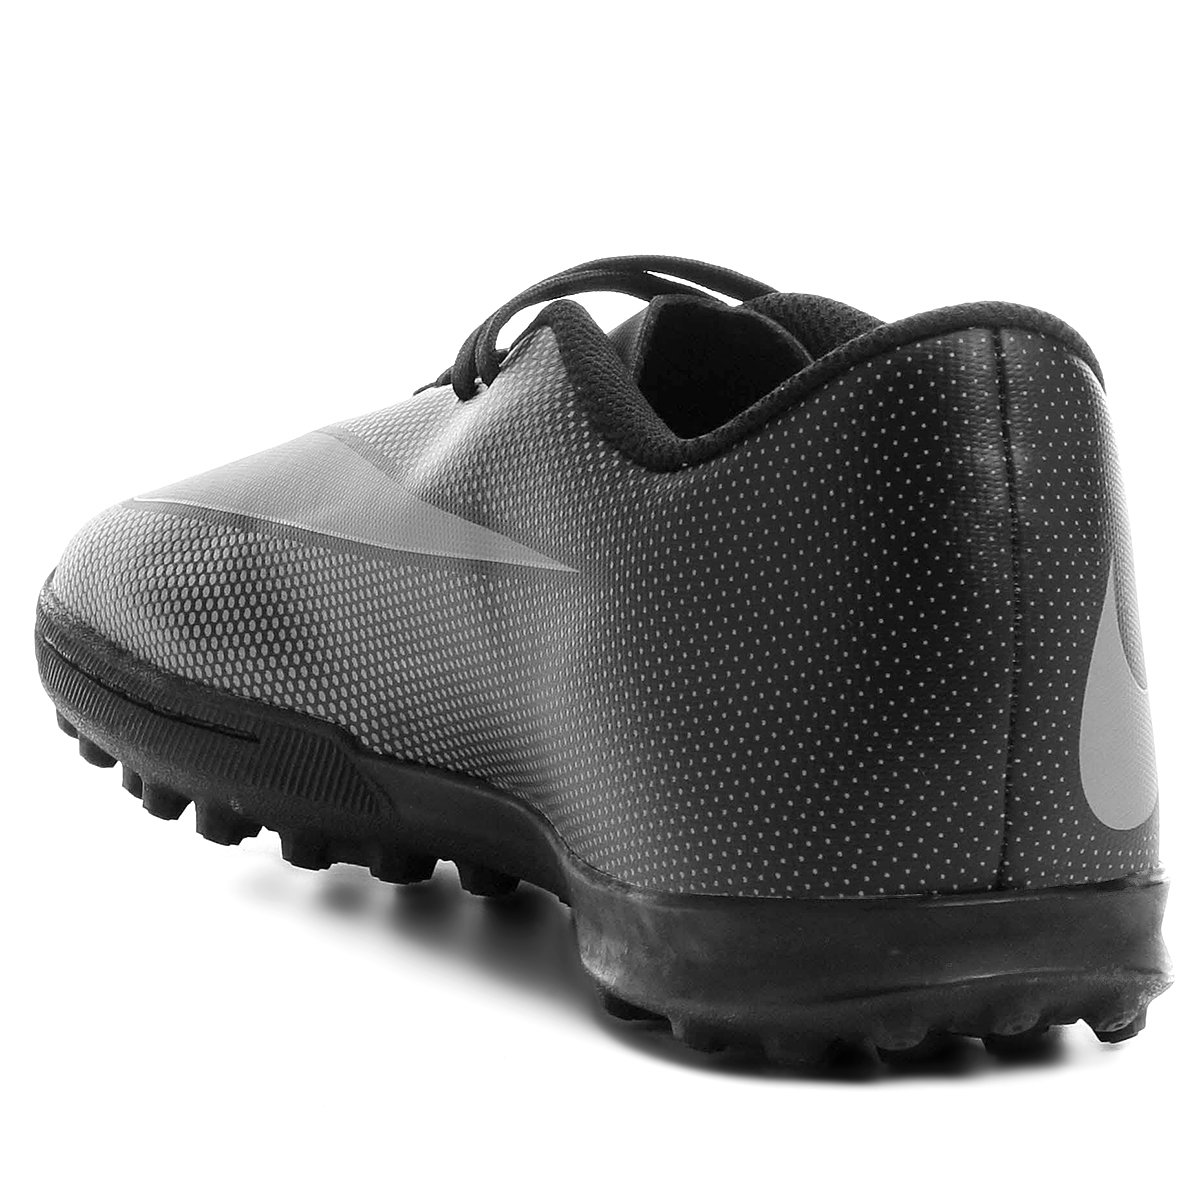 55d7b48b79 Chuteira Society Nike Bravata 2 TF - Preto e Cinza - Compre Agora ...